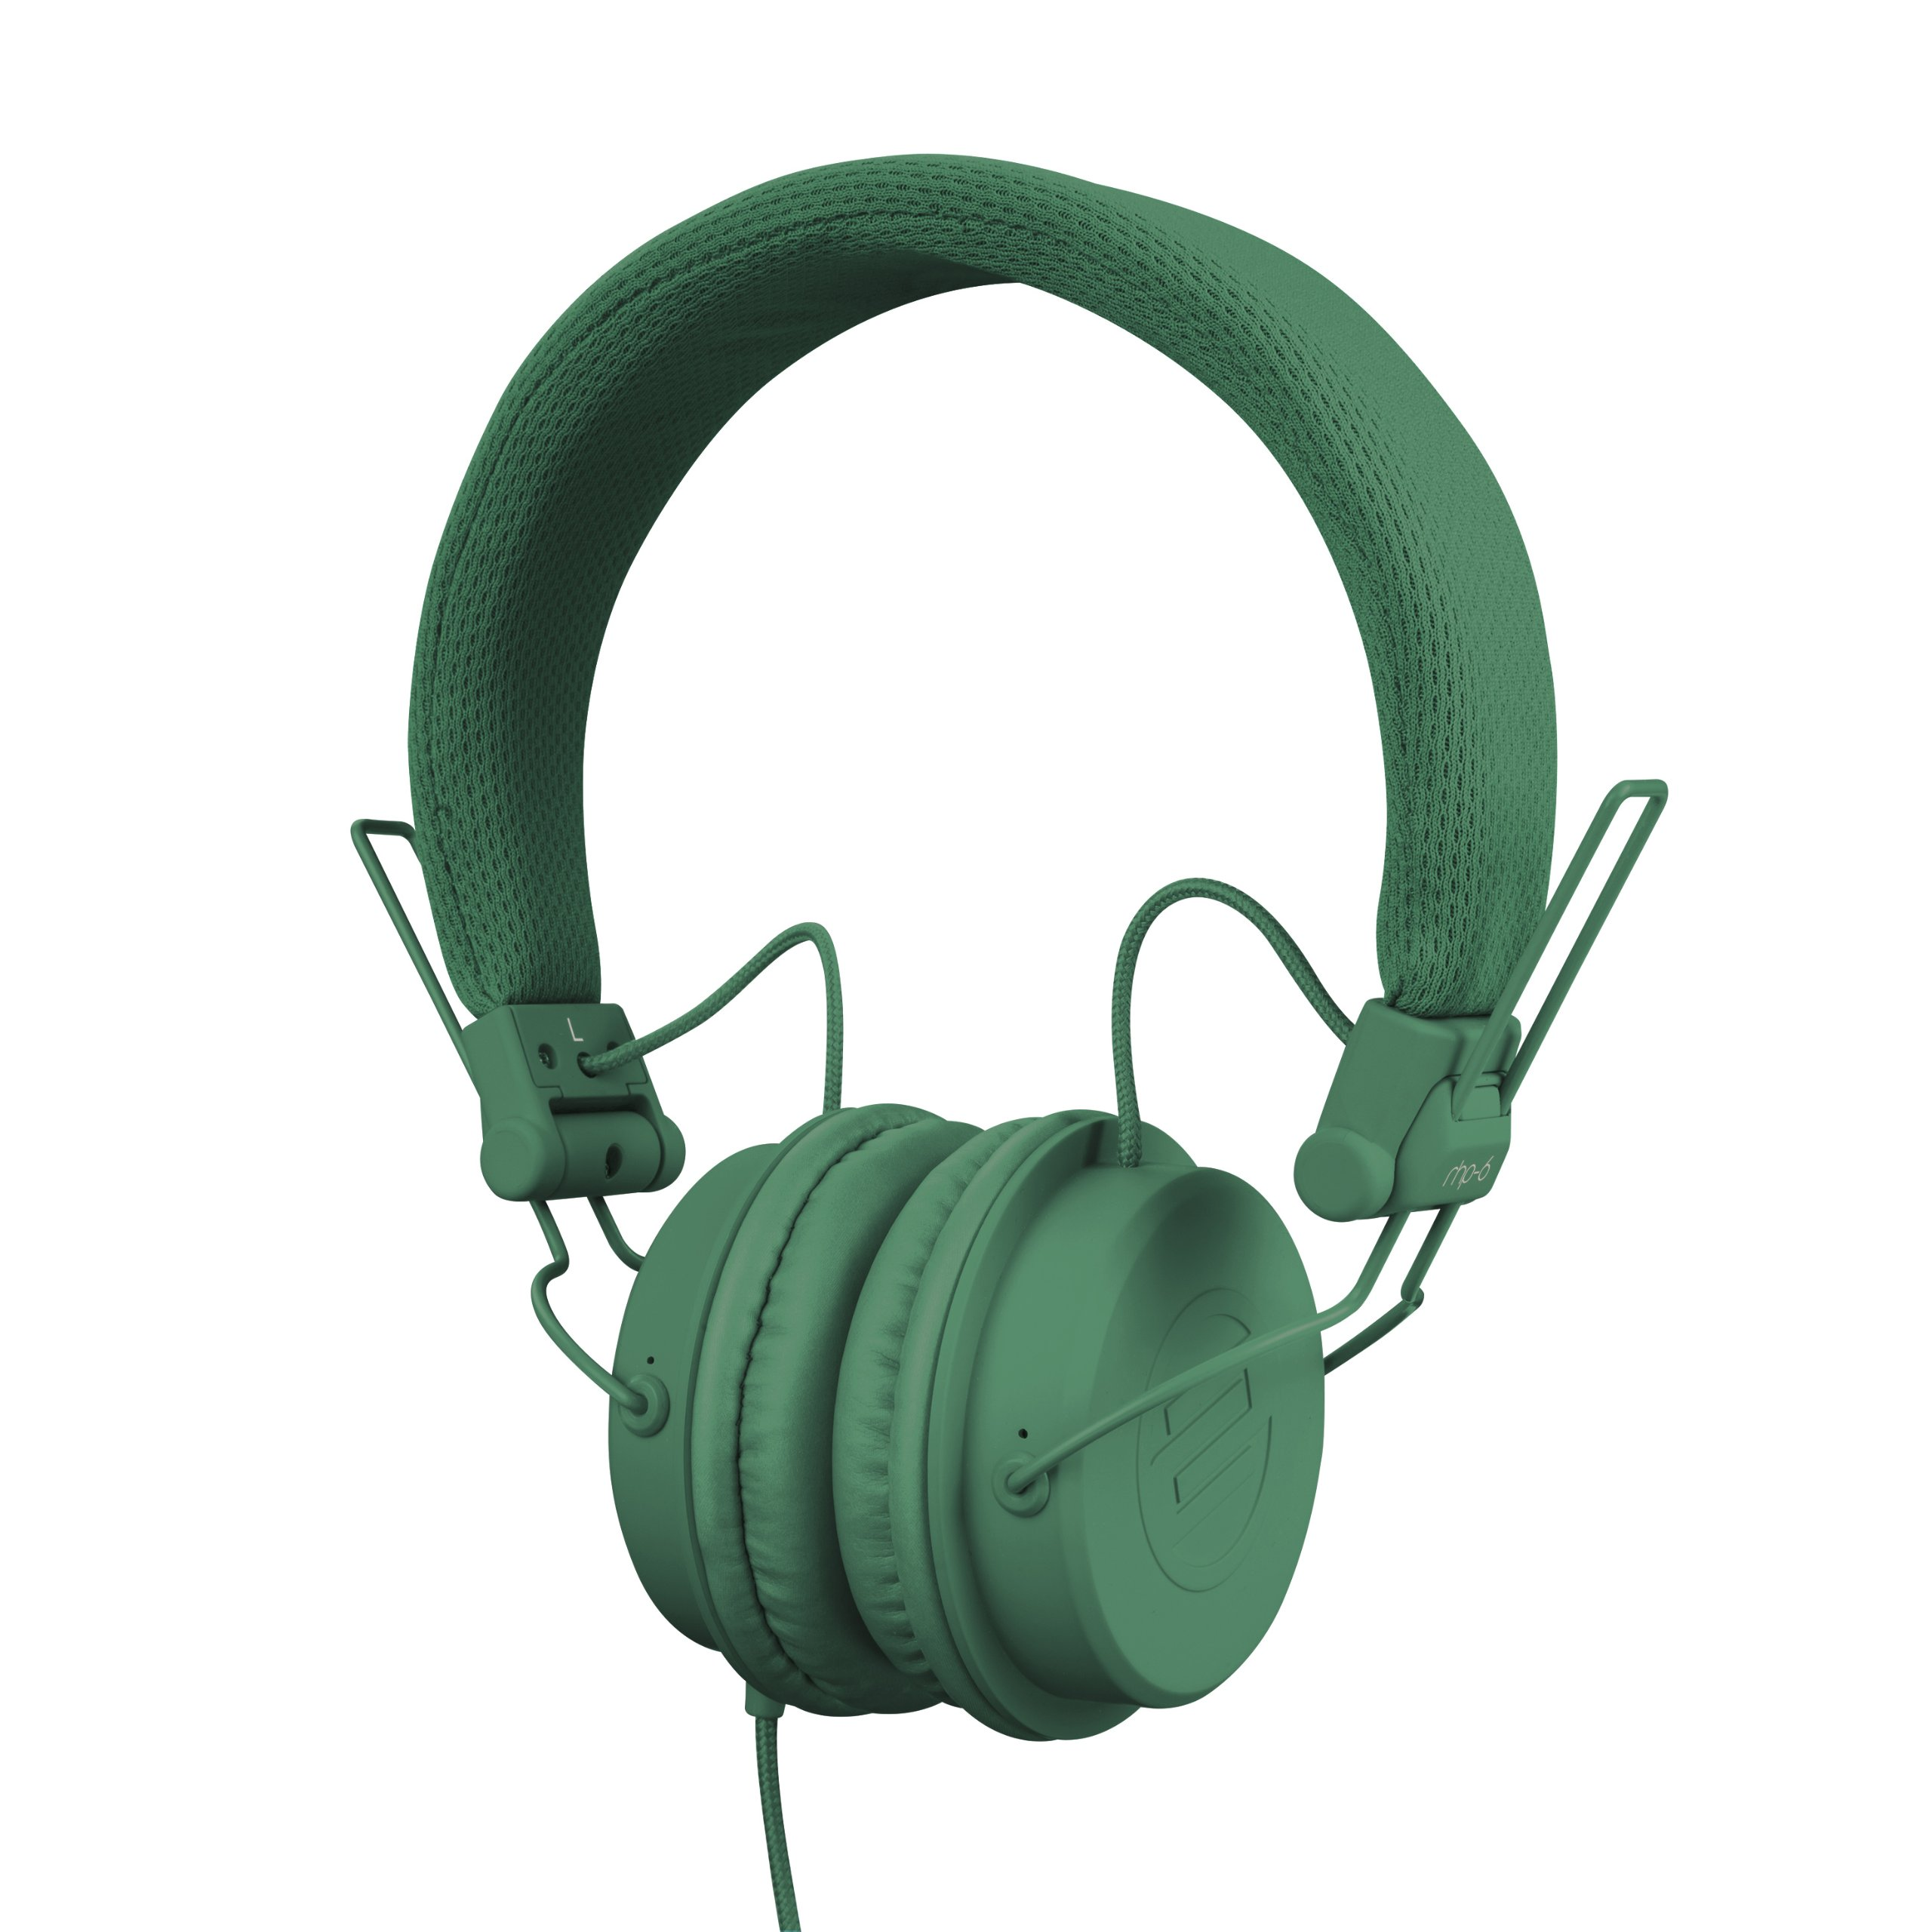 Reloop RHP-6 Ultra Compact DJ and Lifestyle Headphones, Retractable, Closed, Petrol